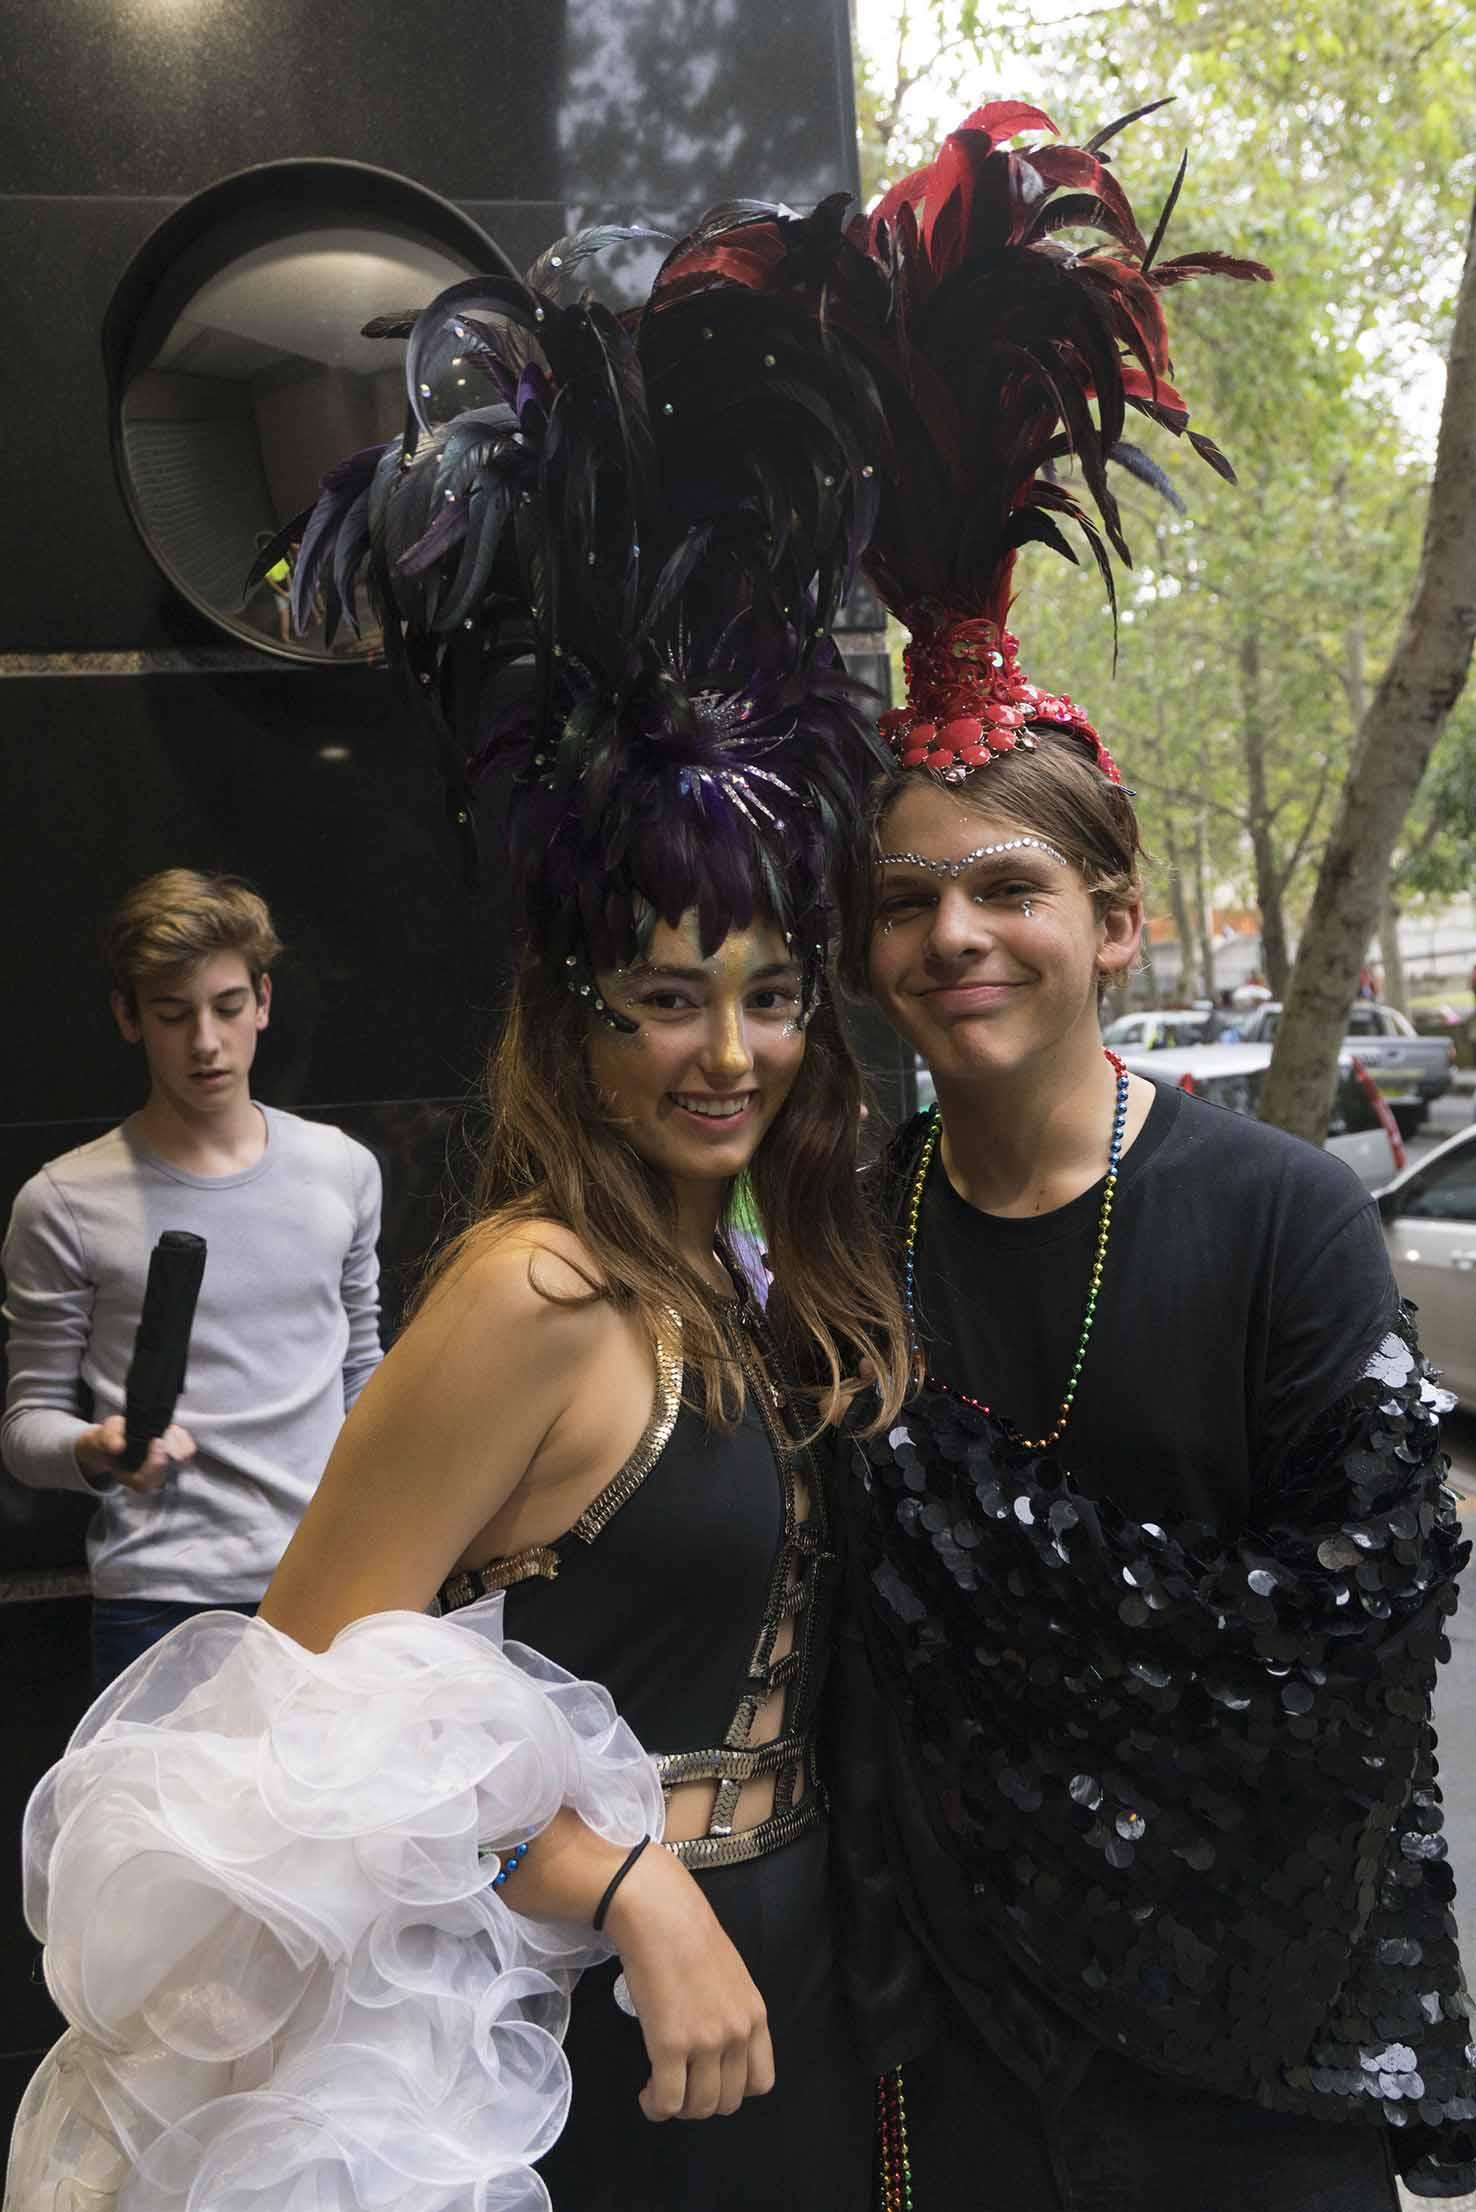 Sydney Mardi Gras shot by Campbell Henderson